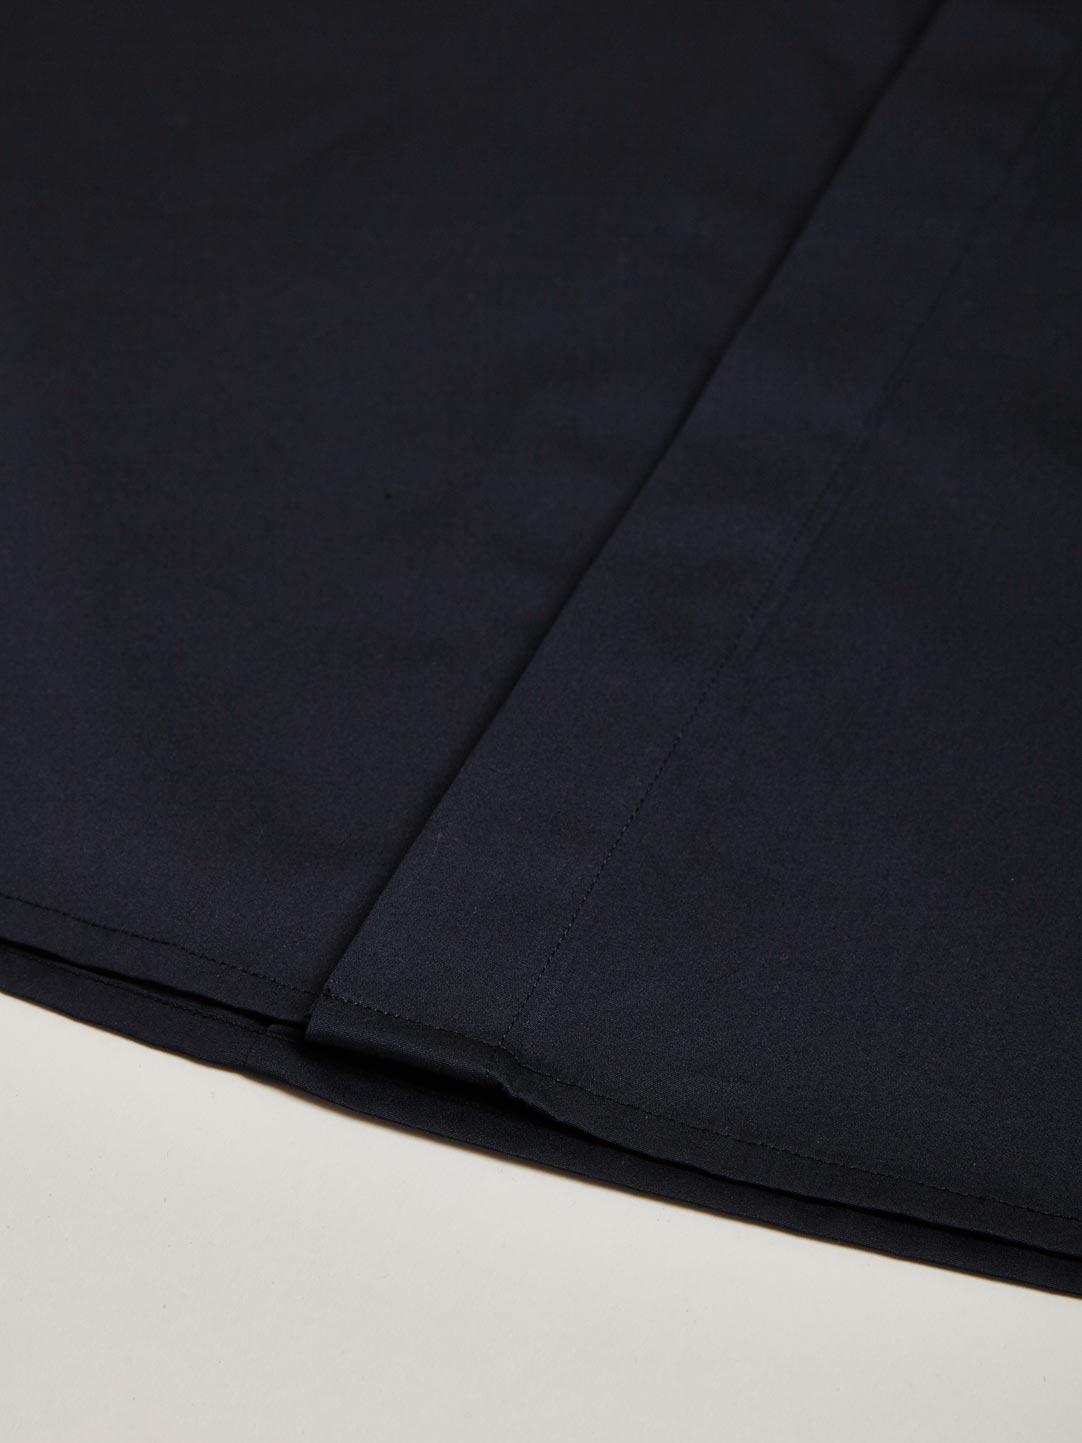 Kimono Dervish Collar Shirt Thamanyah 4